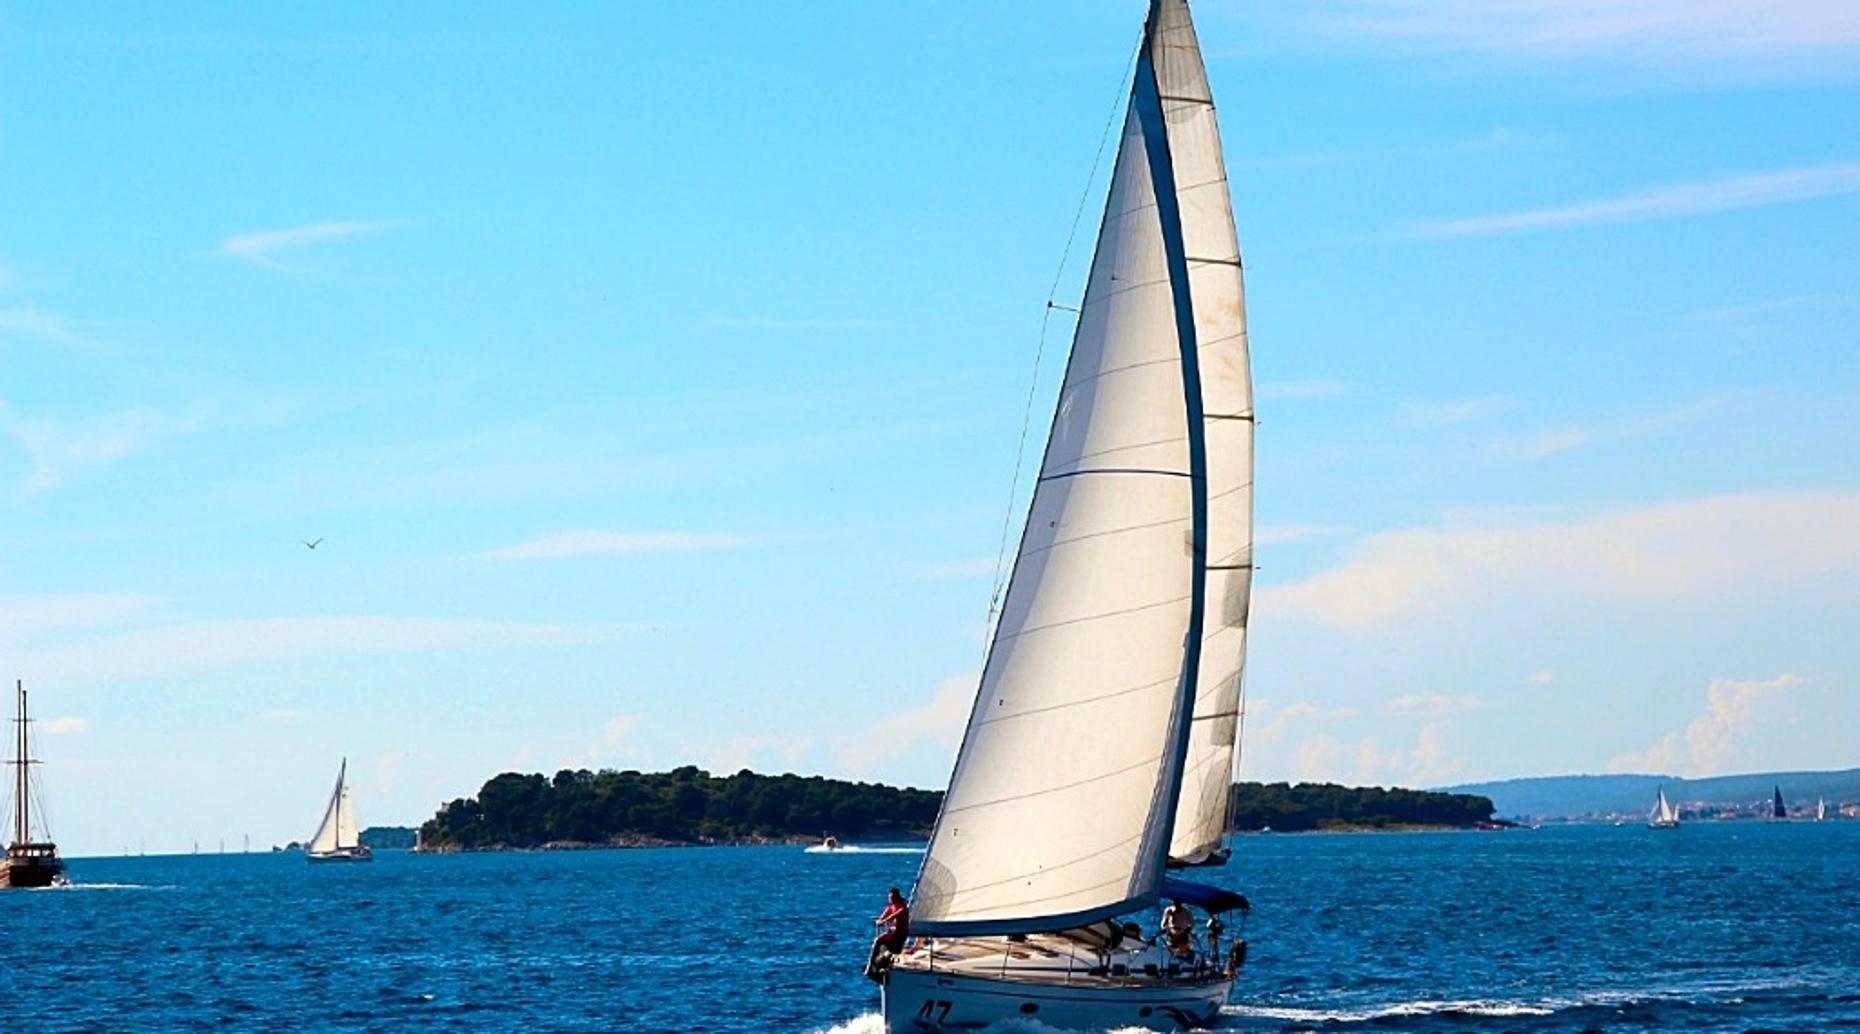 2-Hour San Francisco Bay Sailing Tour